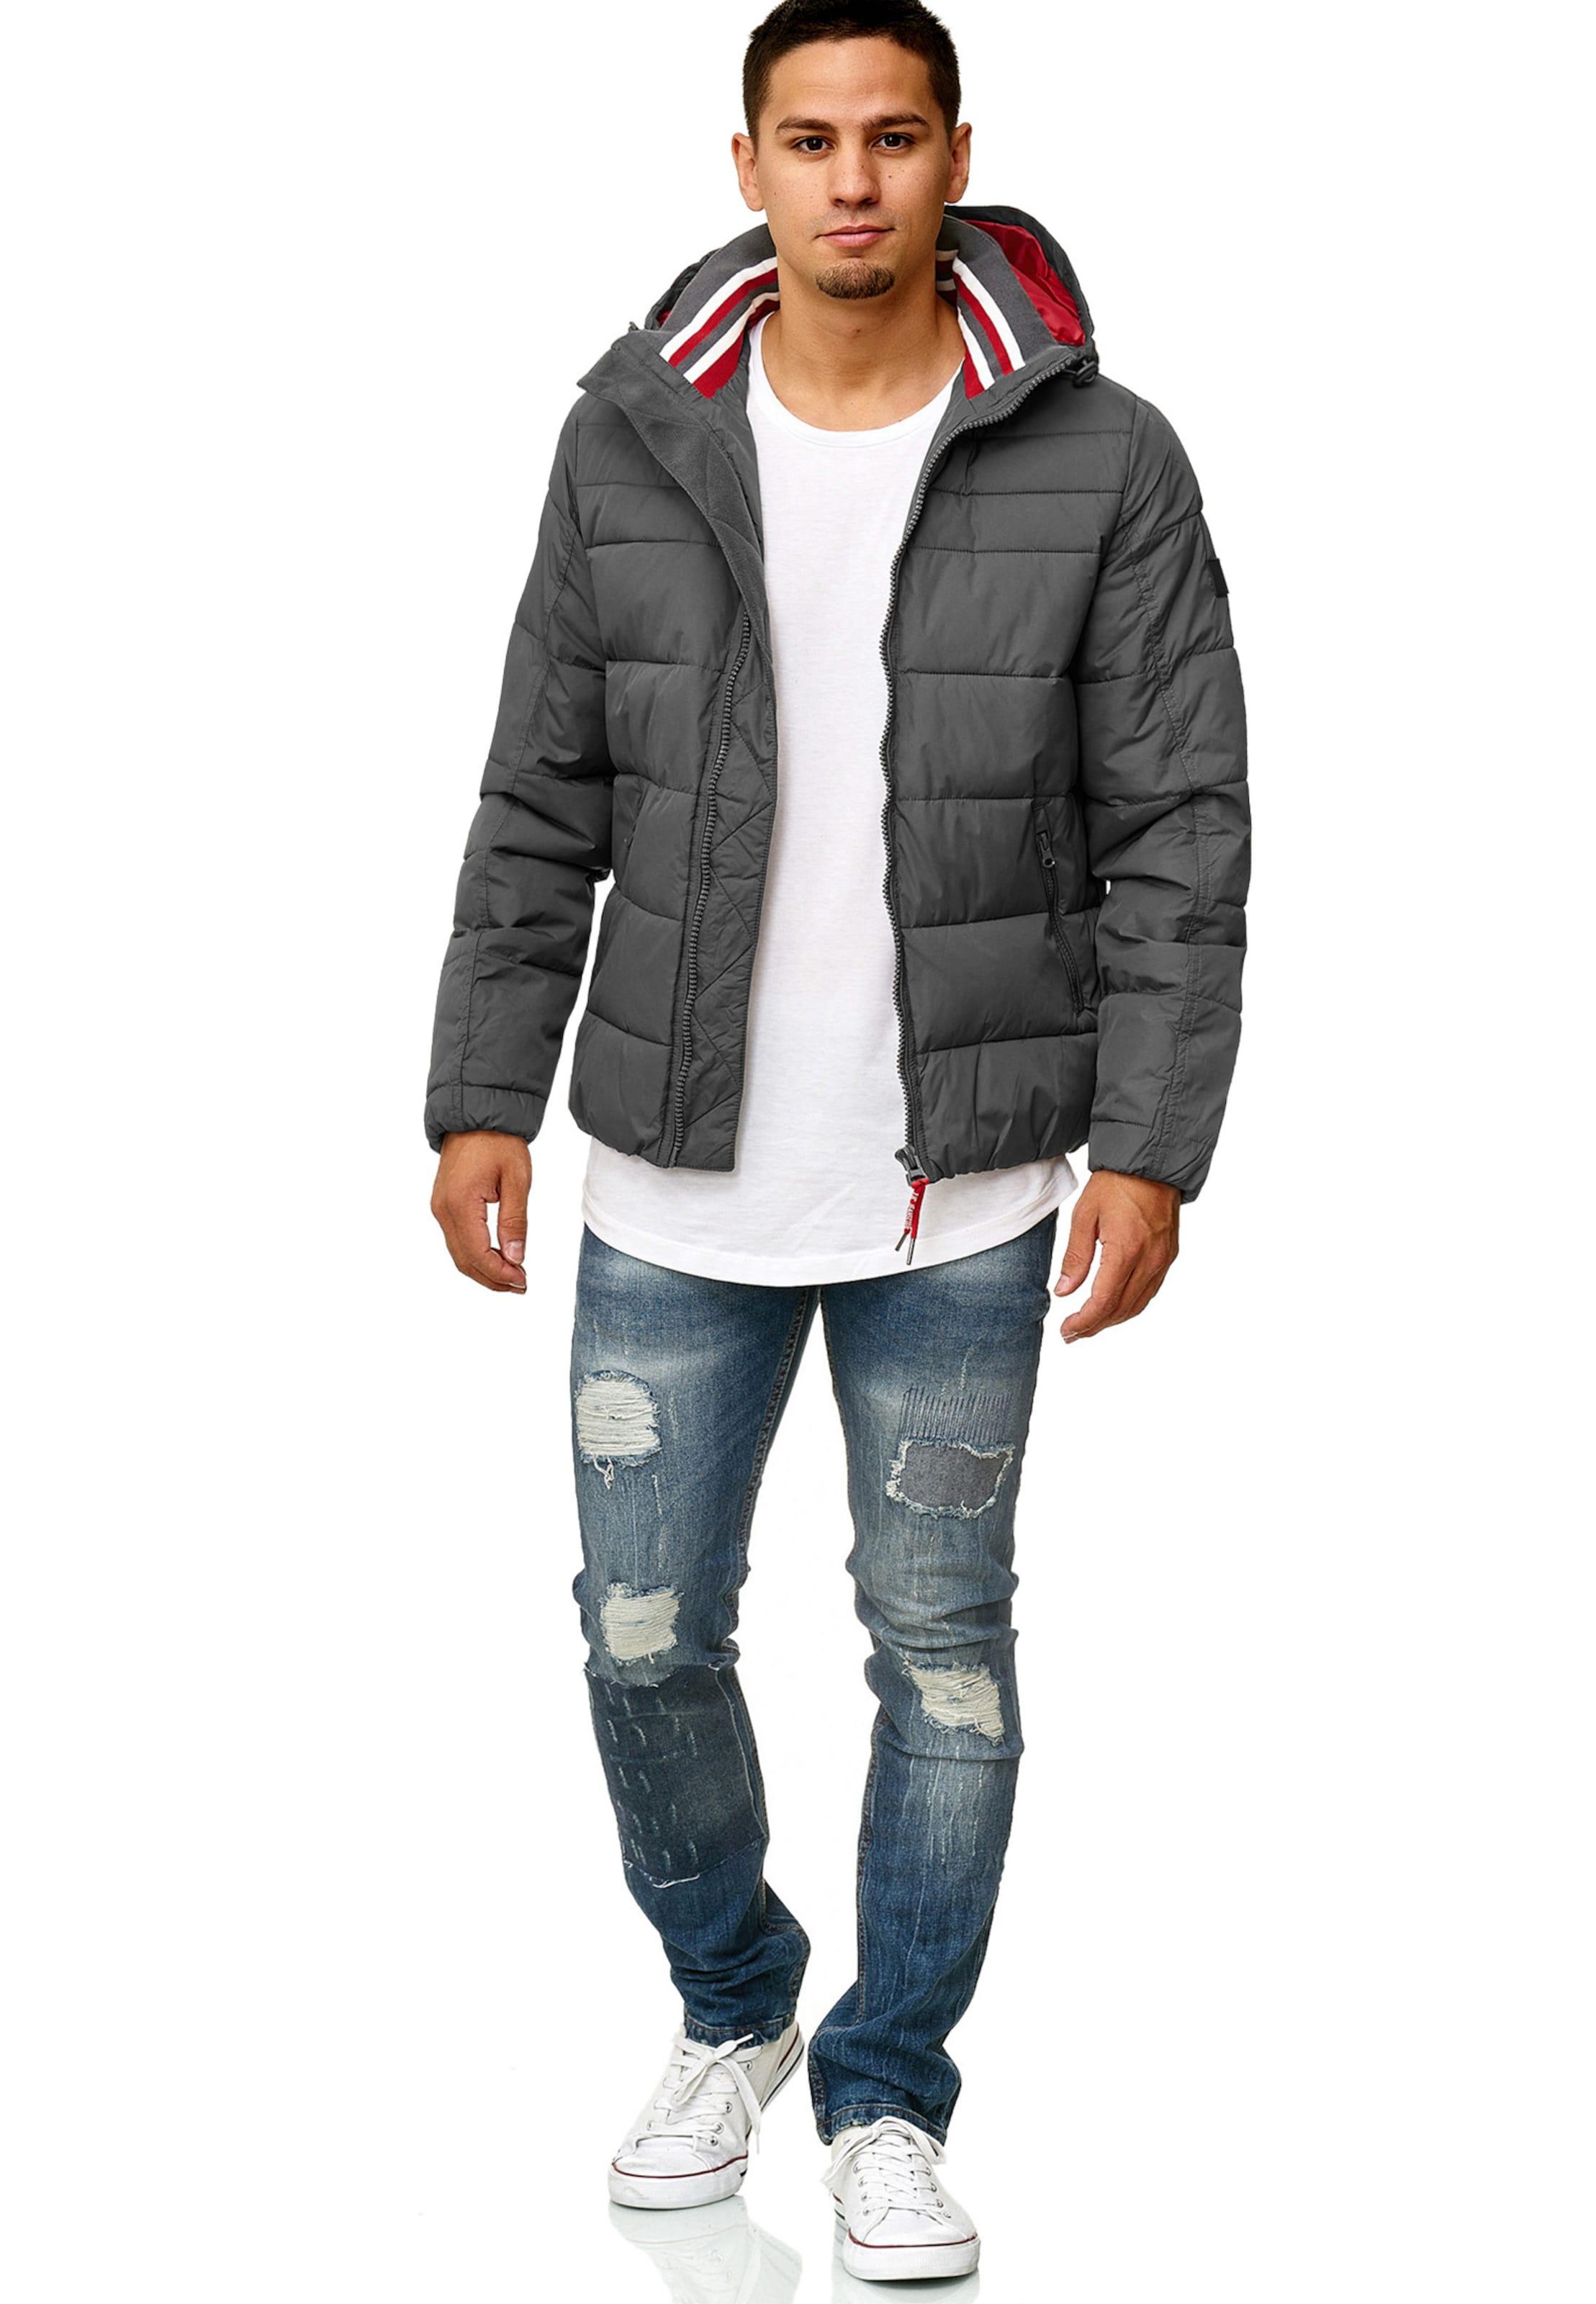 Marine Bleu Philpot En Jeans D'hiver Winter ' Veste Jacke Indicode OPiwXZkTu